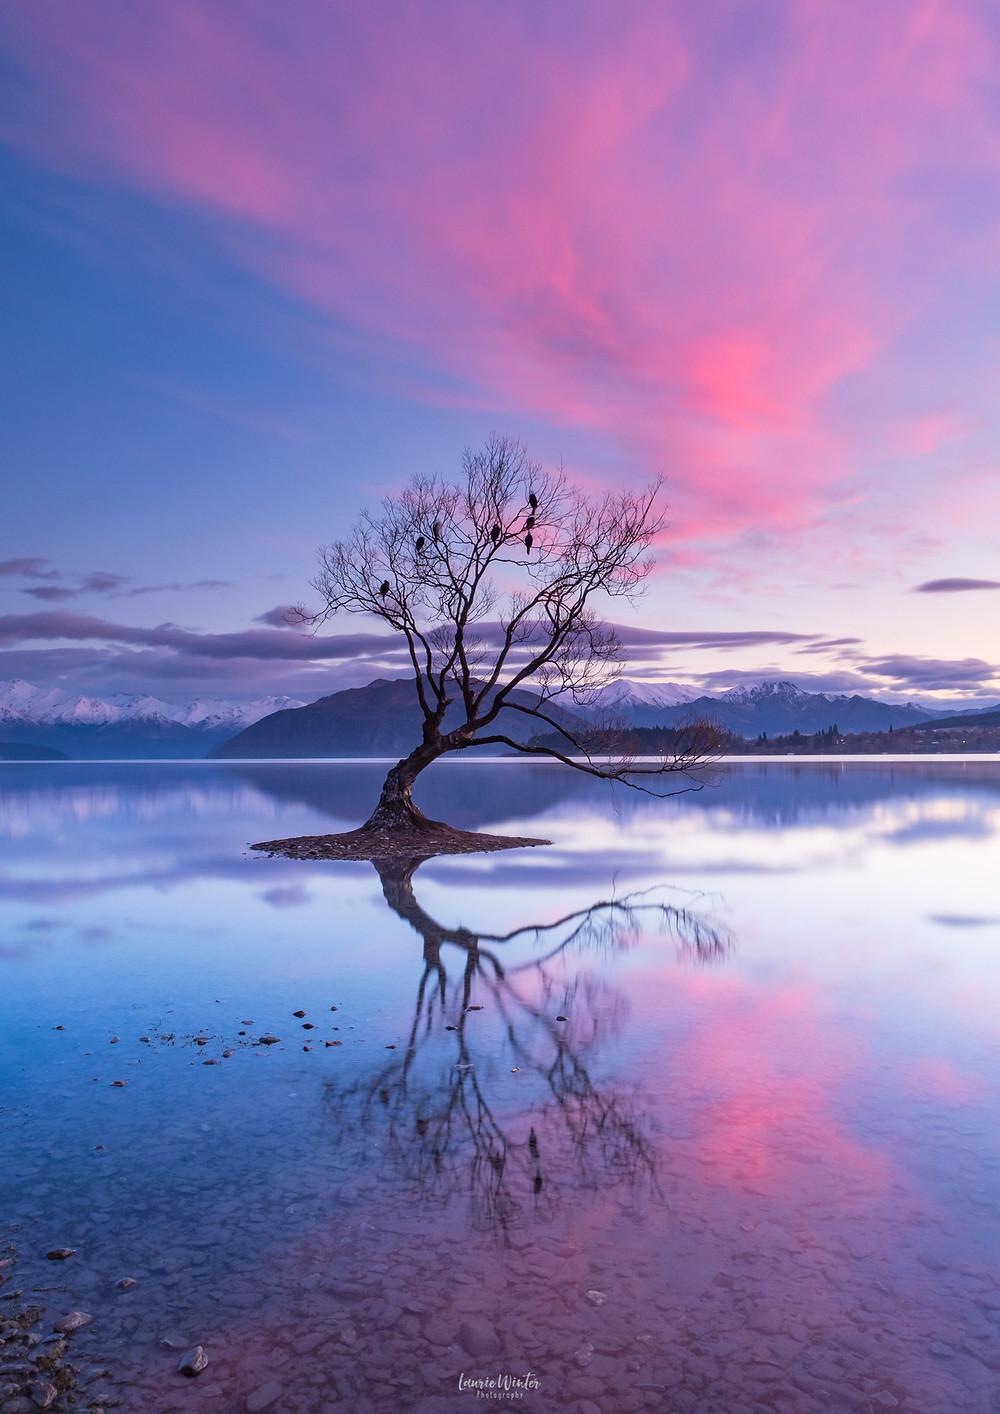 Wanaka tree reflections in the lake pink sunrise